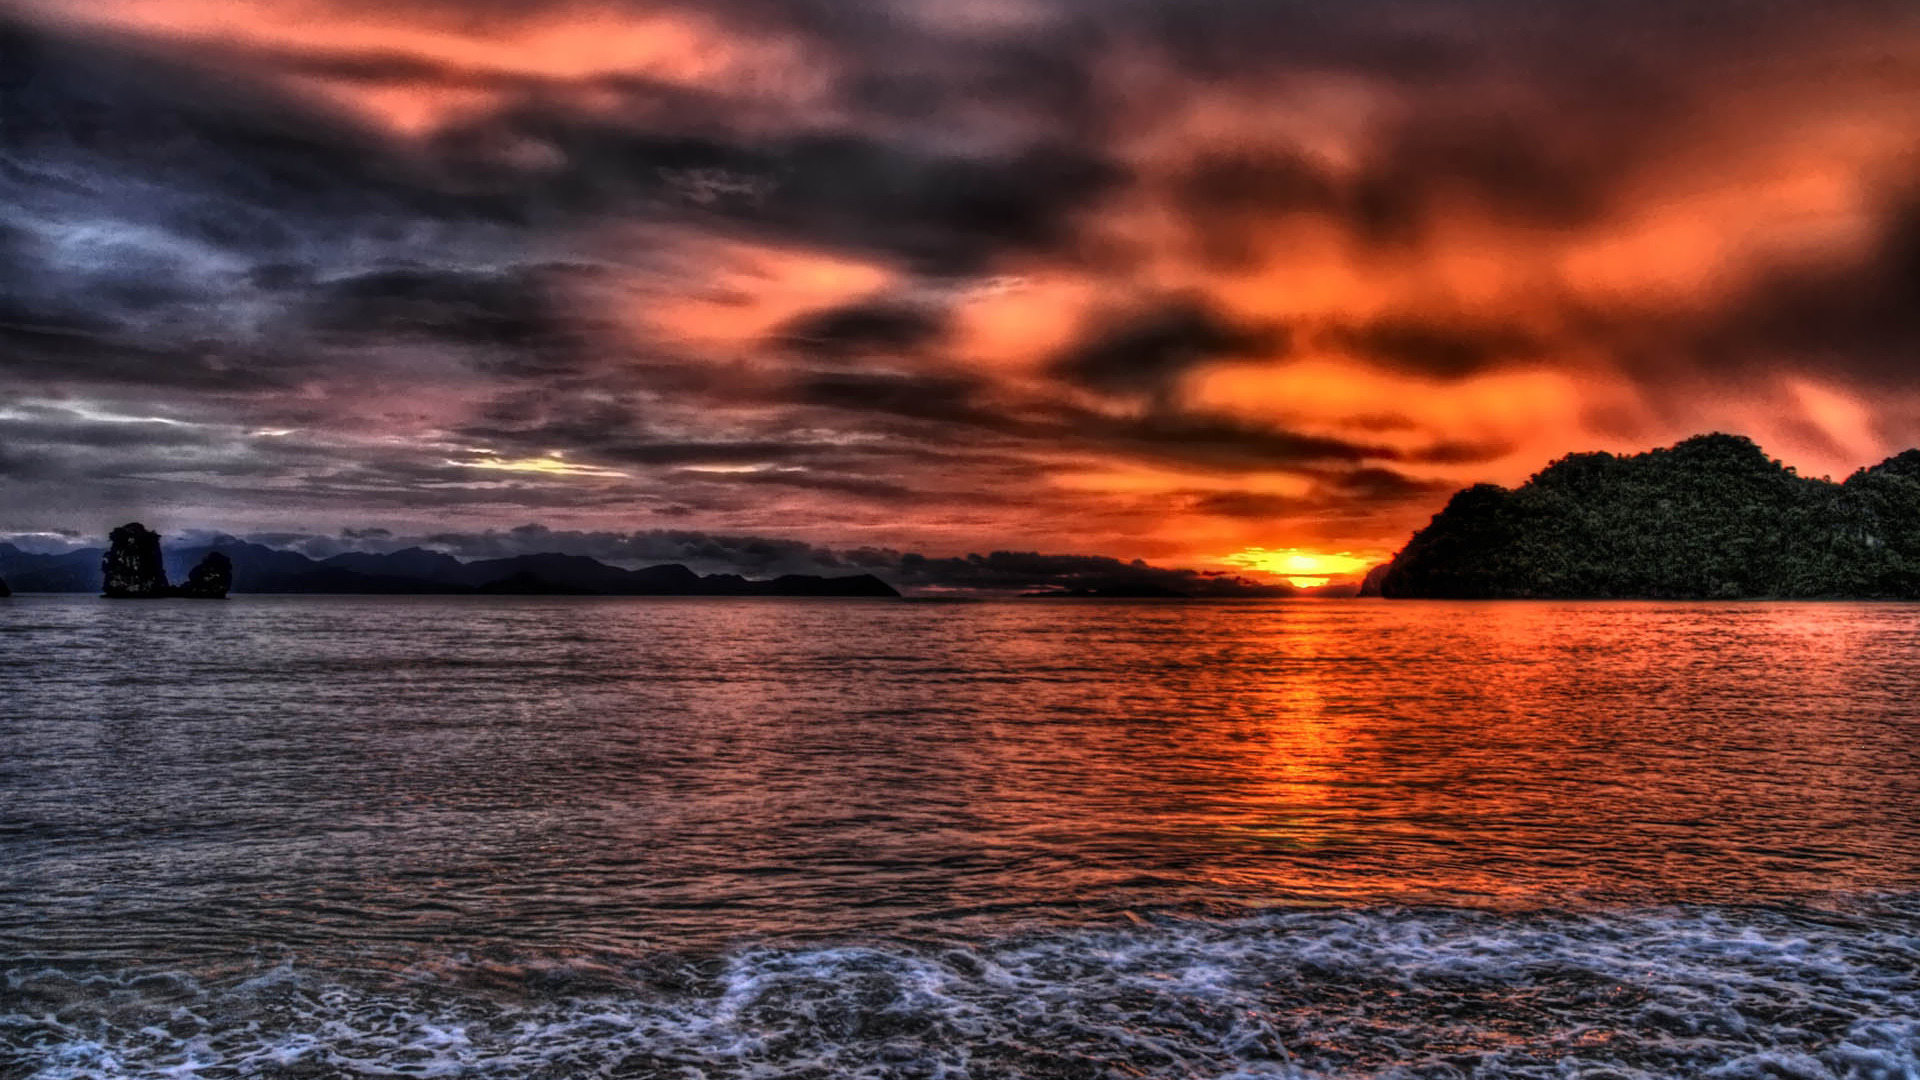 Sunset on the beach wallpaper #2144